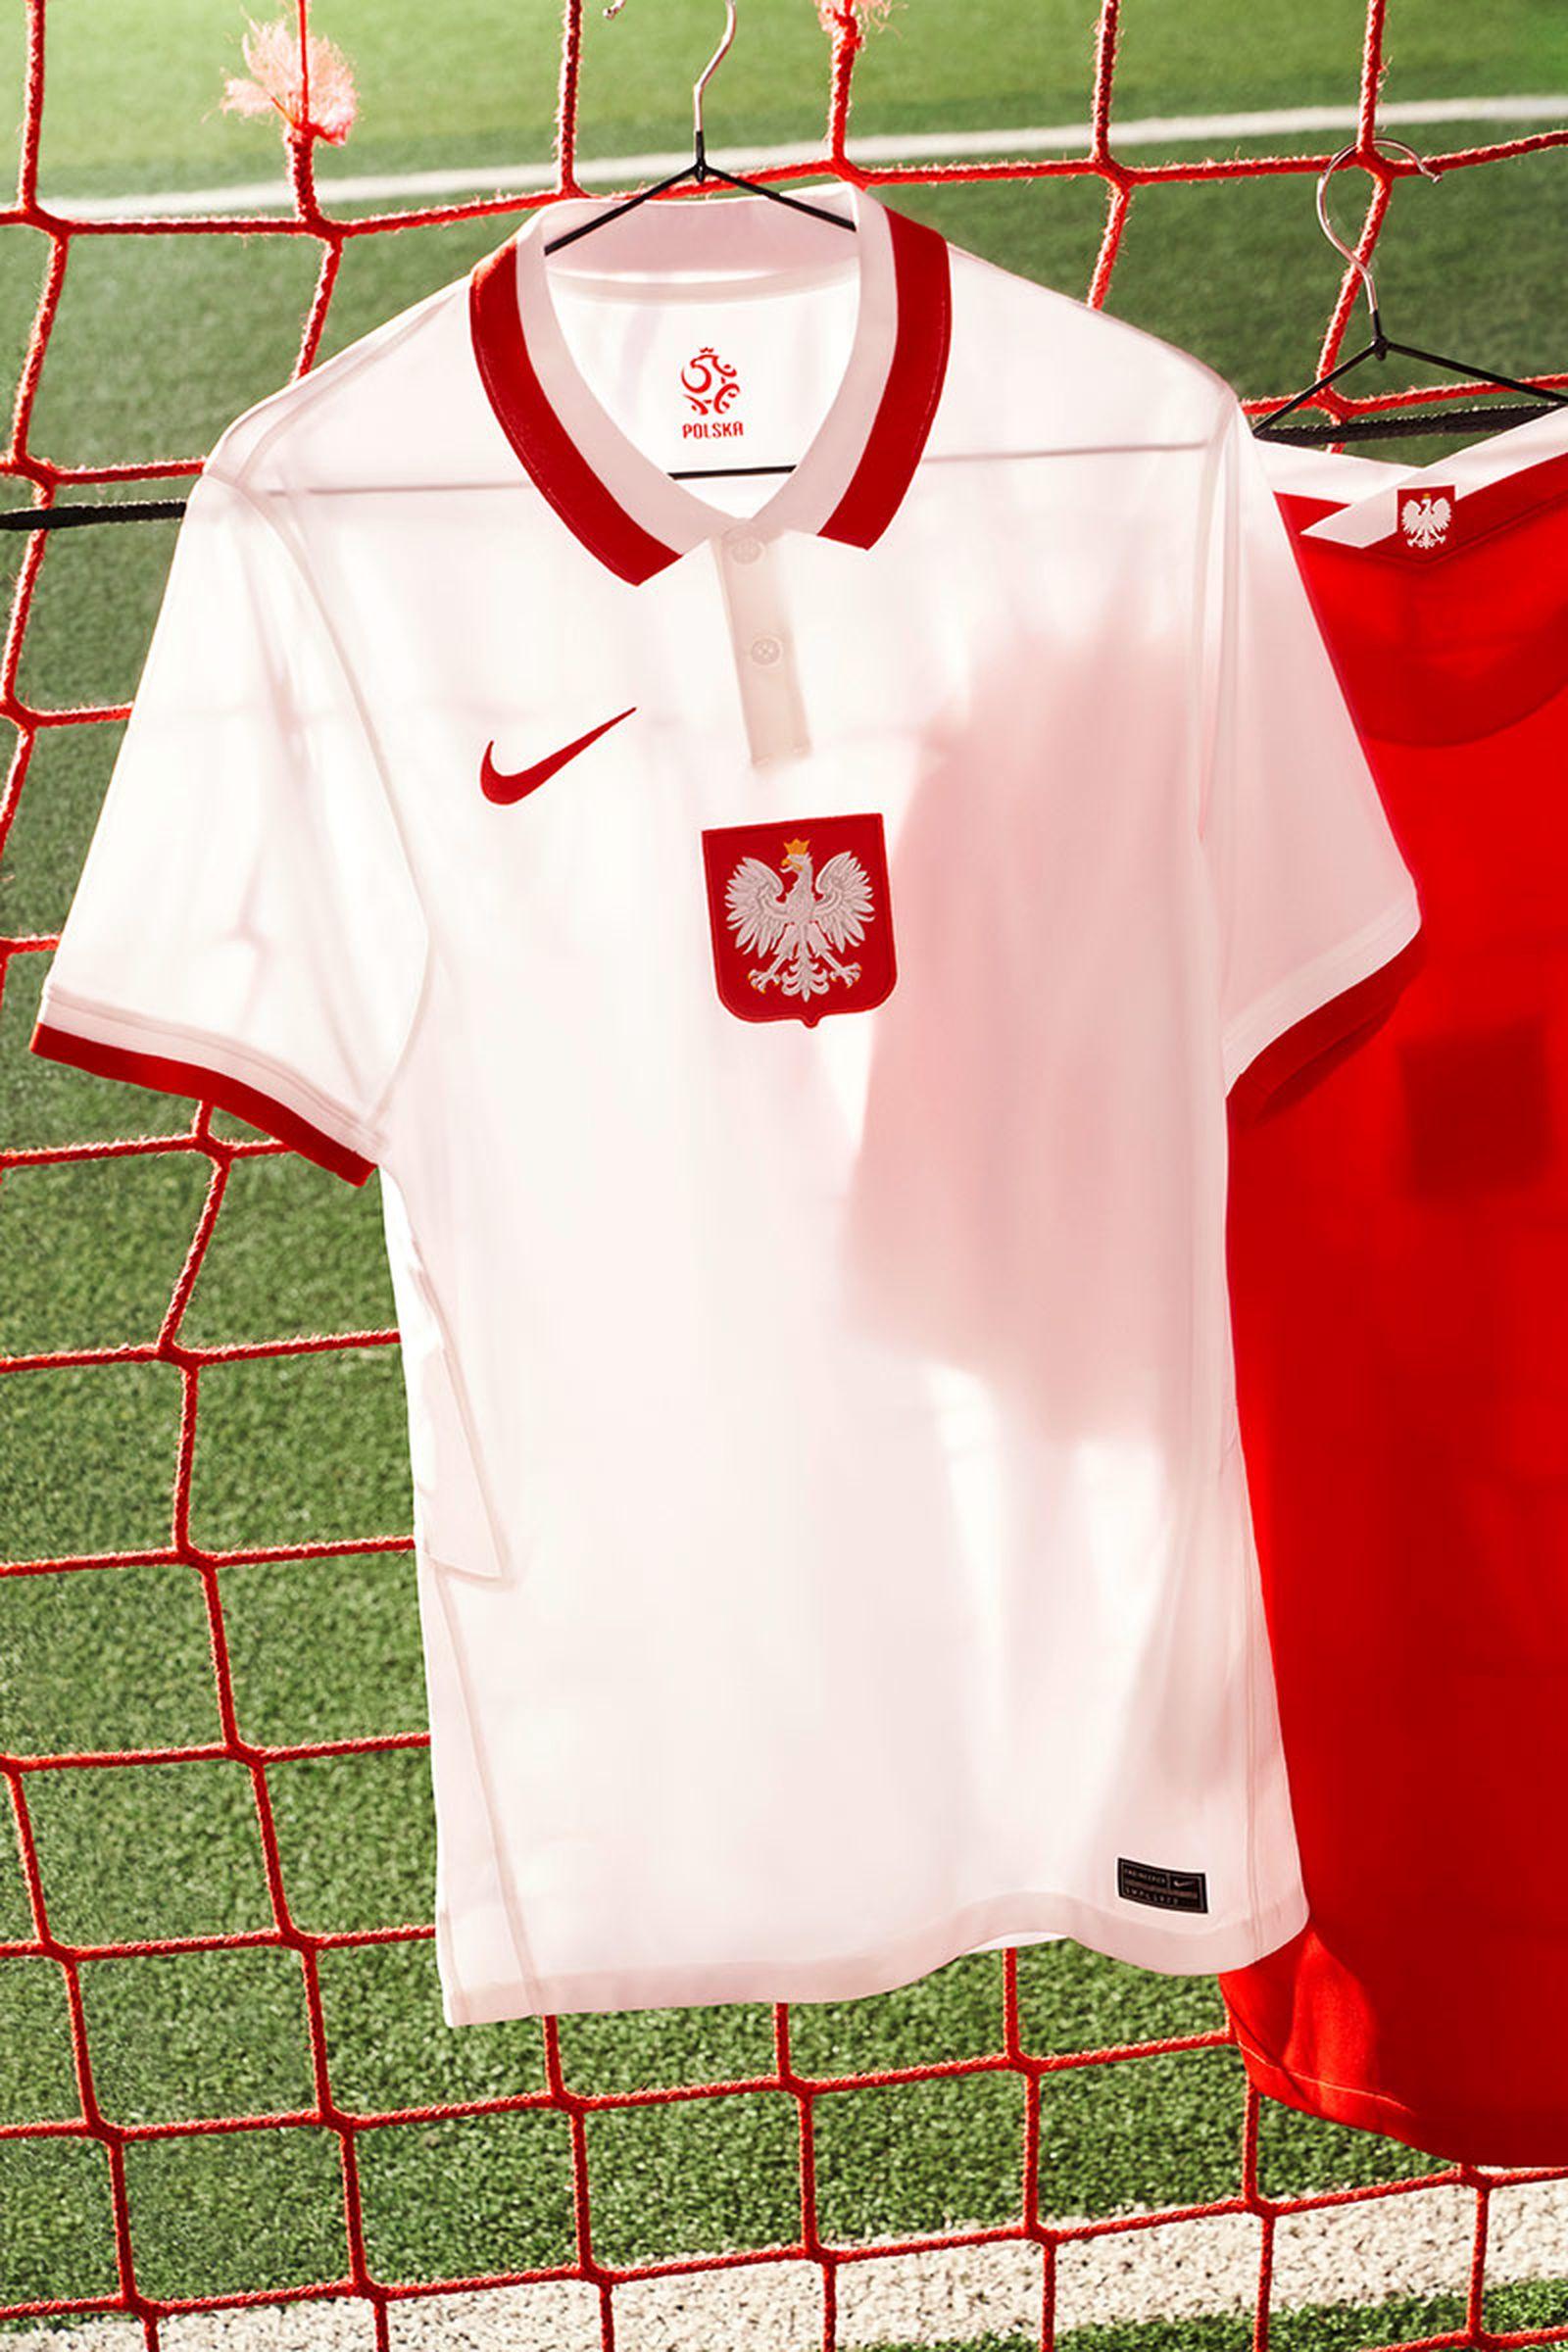 nike-national-team-kits-2020-ranking-09